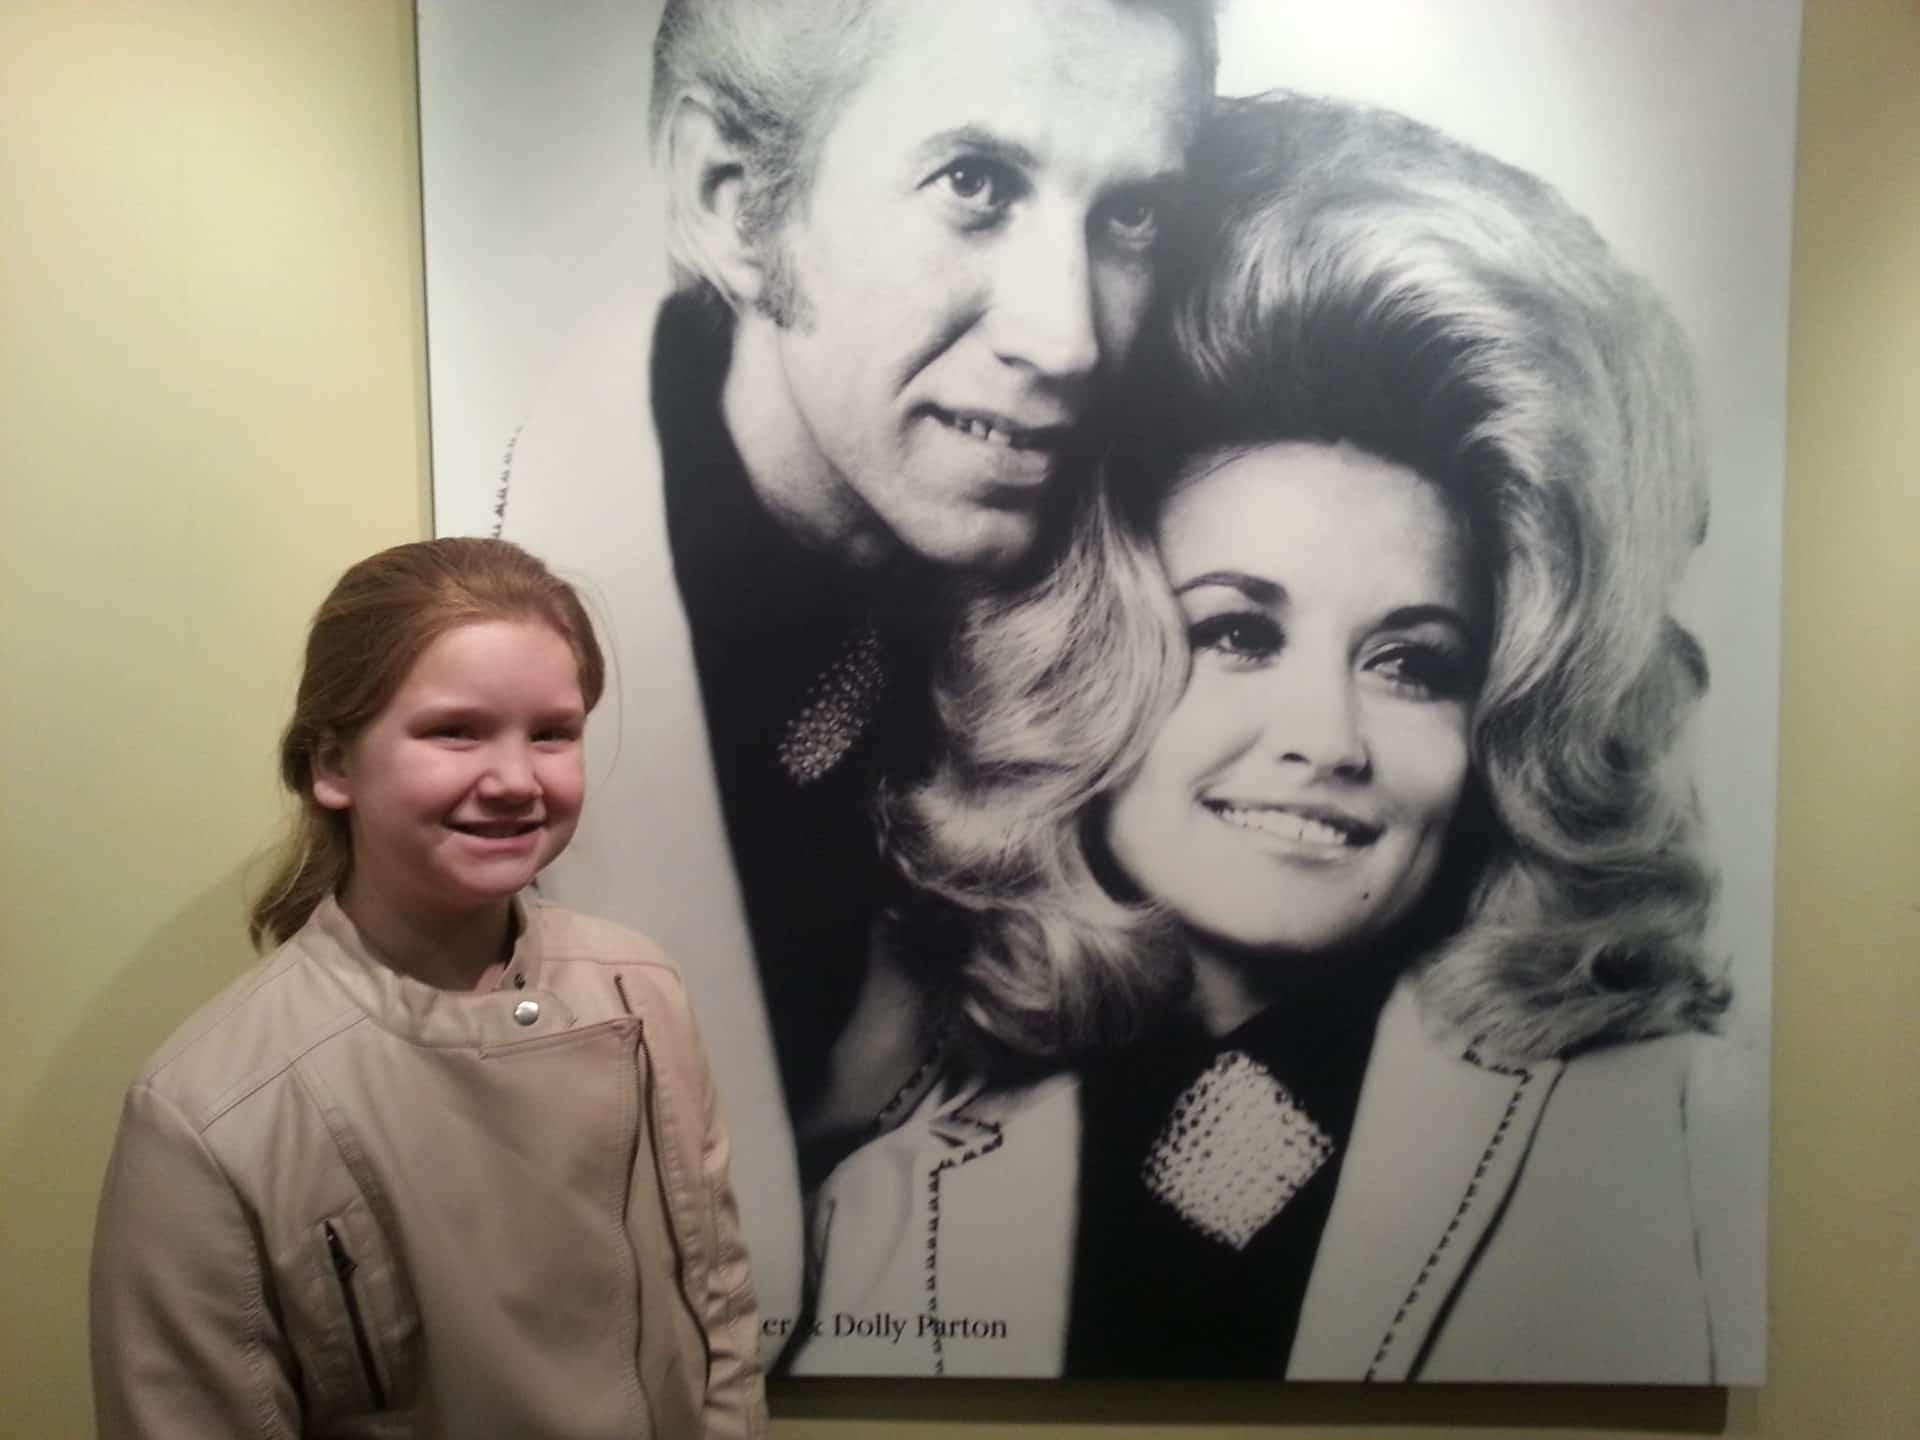 RCA Studio B Tour young Dolly Parton photo